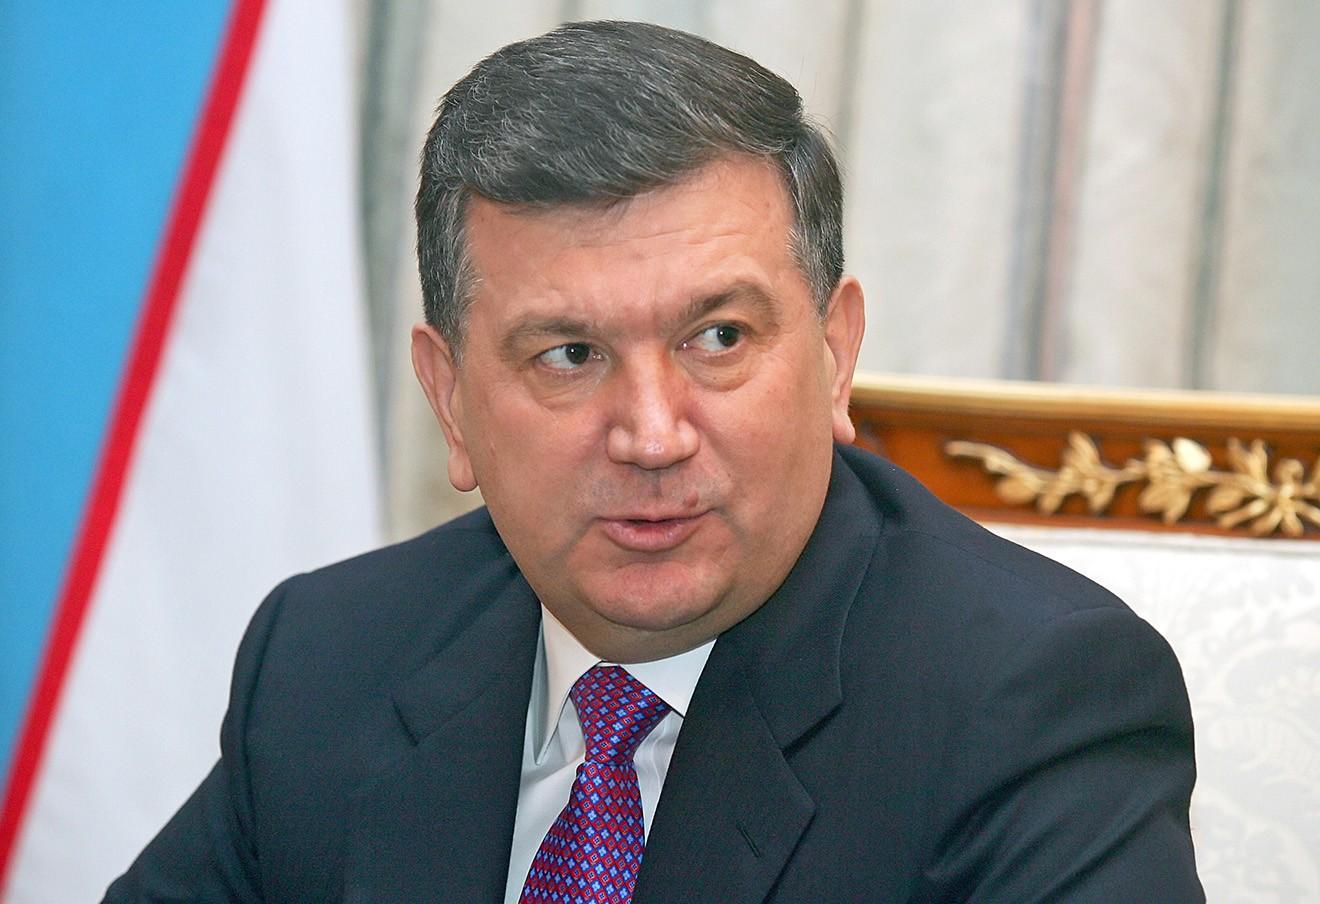 Президент Узбекистана подписал закон оборьбе скоррупцией